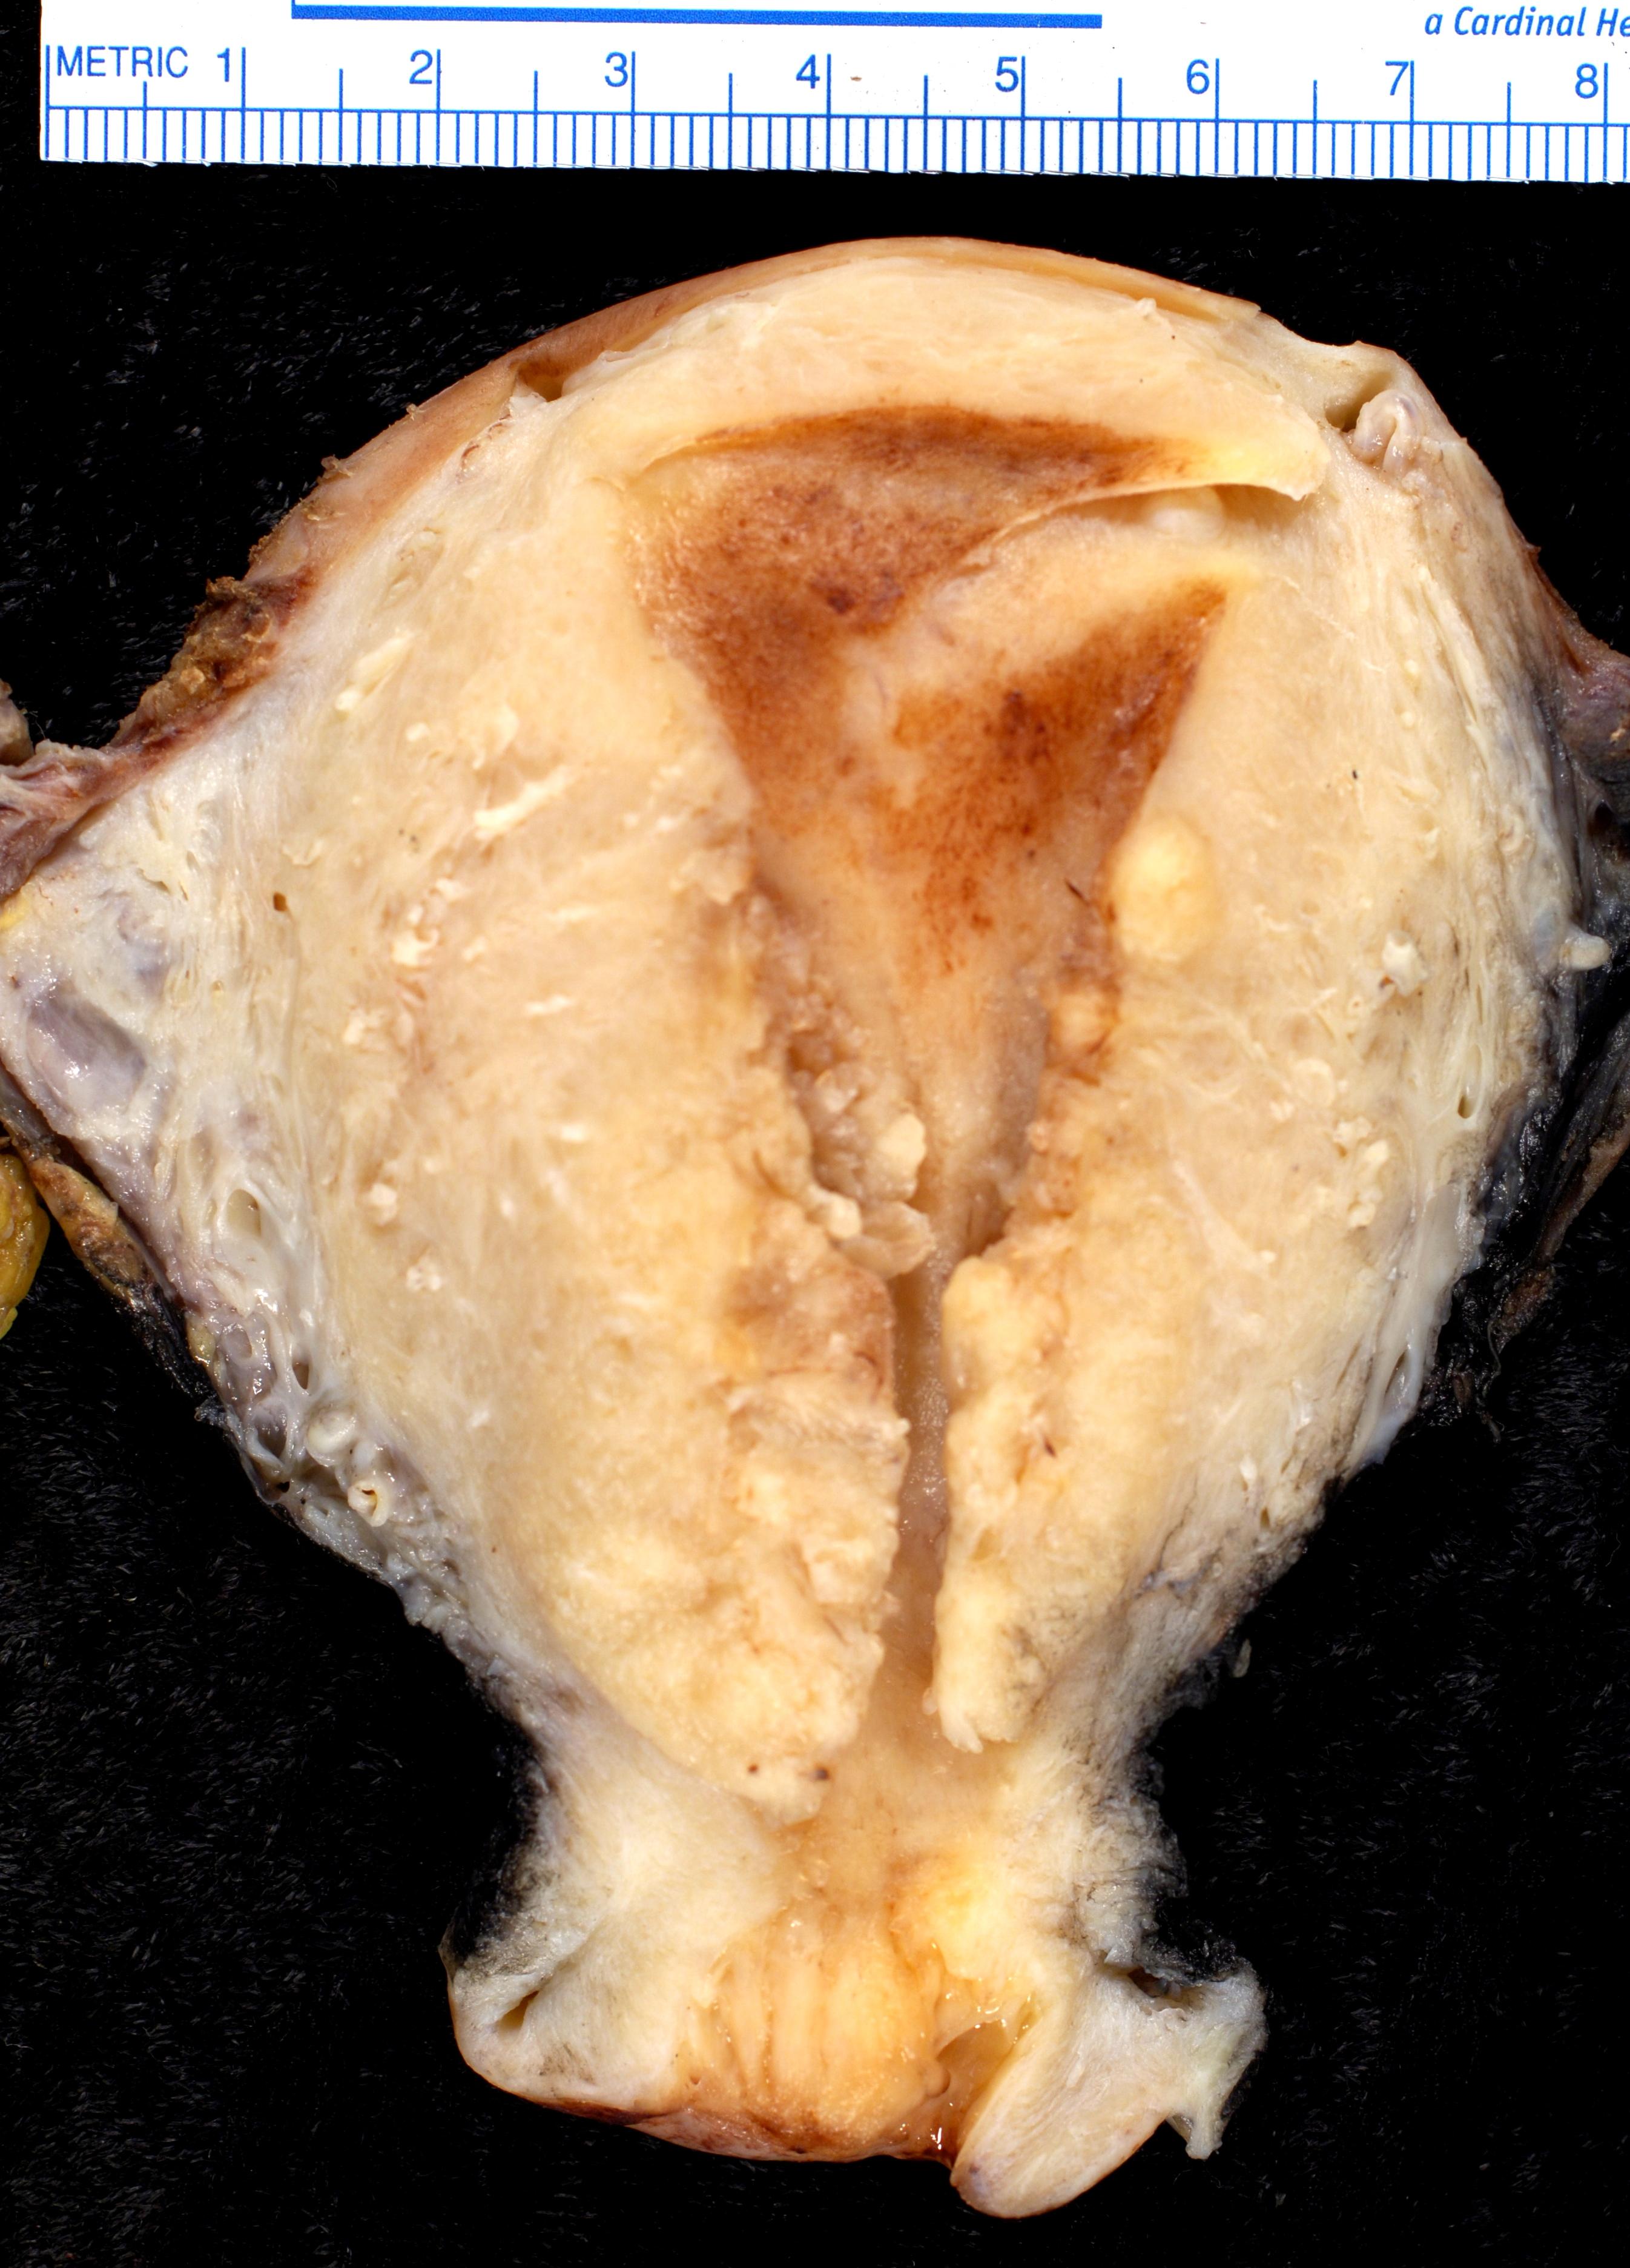 cancer de utero endometrial